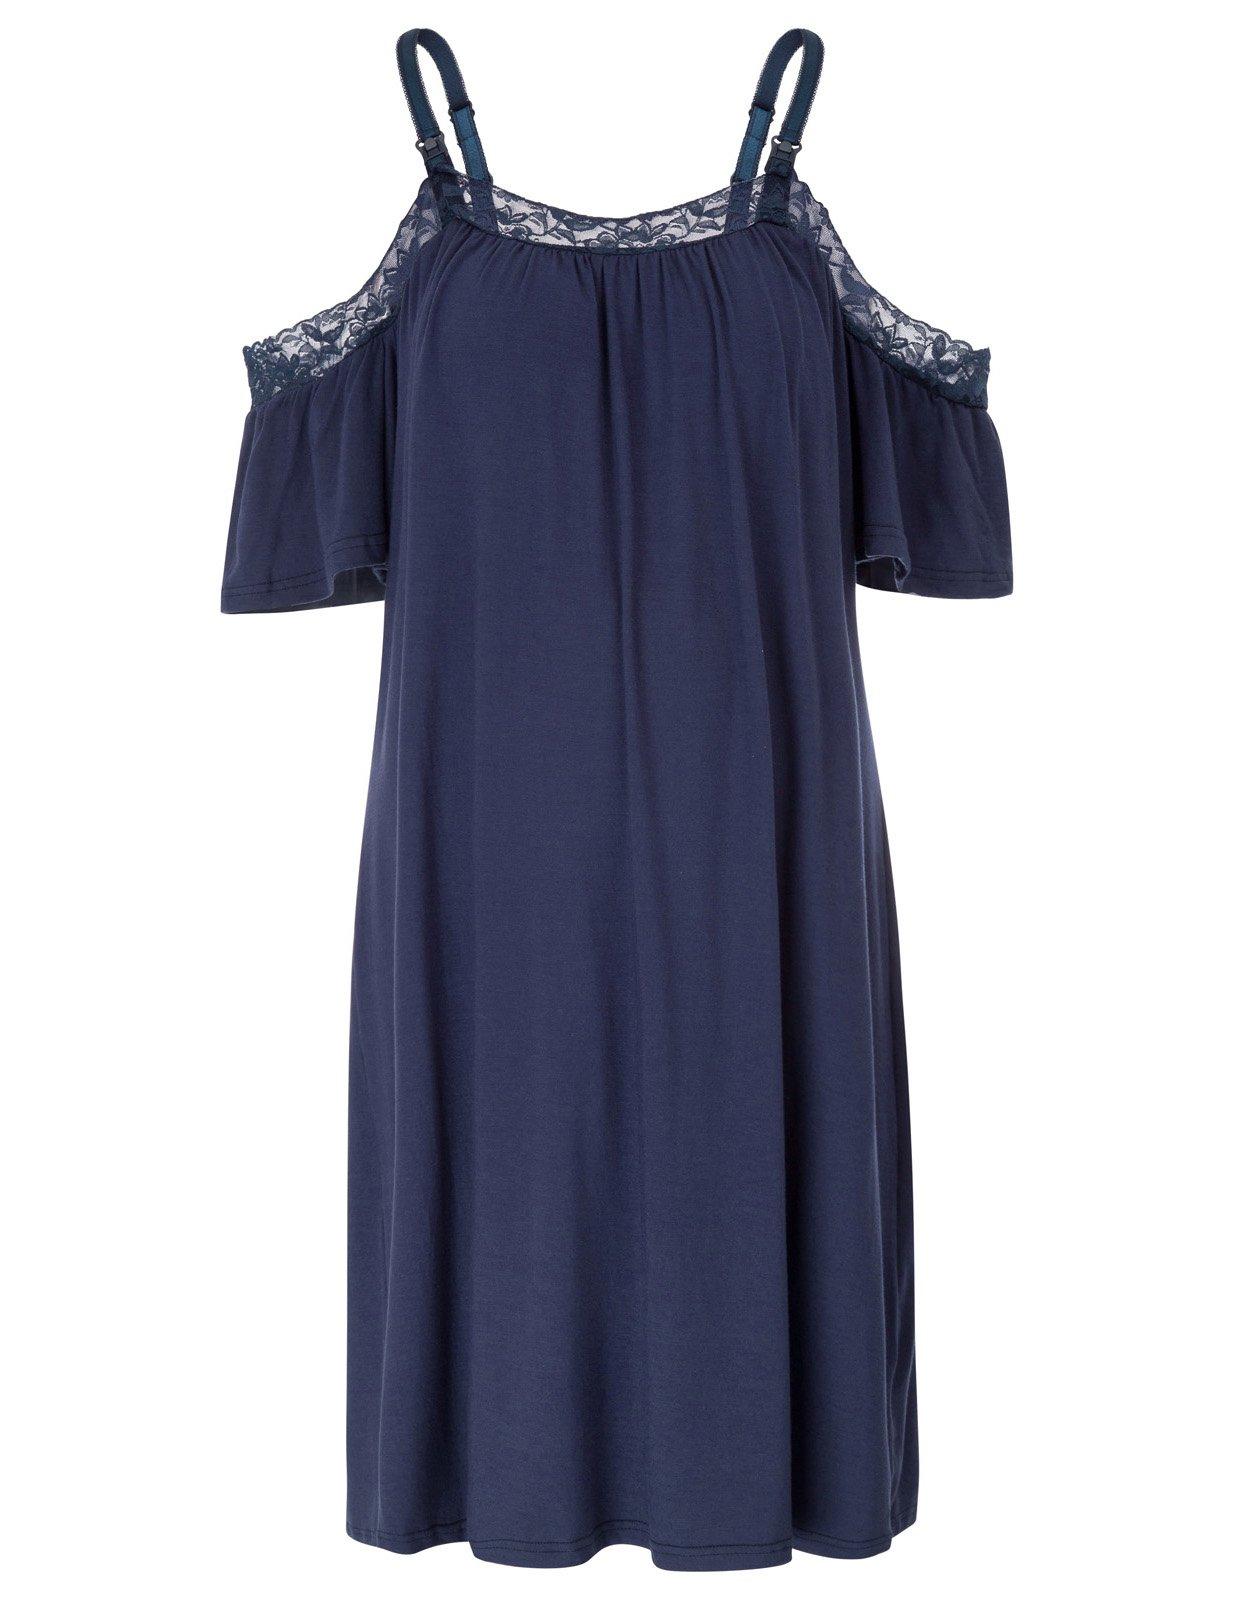 Maternity Dress Spaghetti Strap Cotton Sleepwear with Adjustable Strap XXL Navy Blue